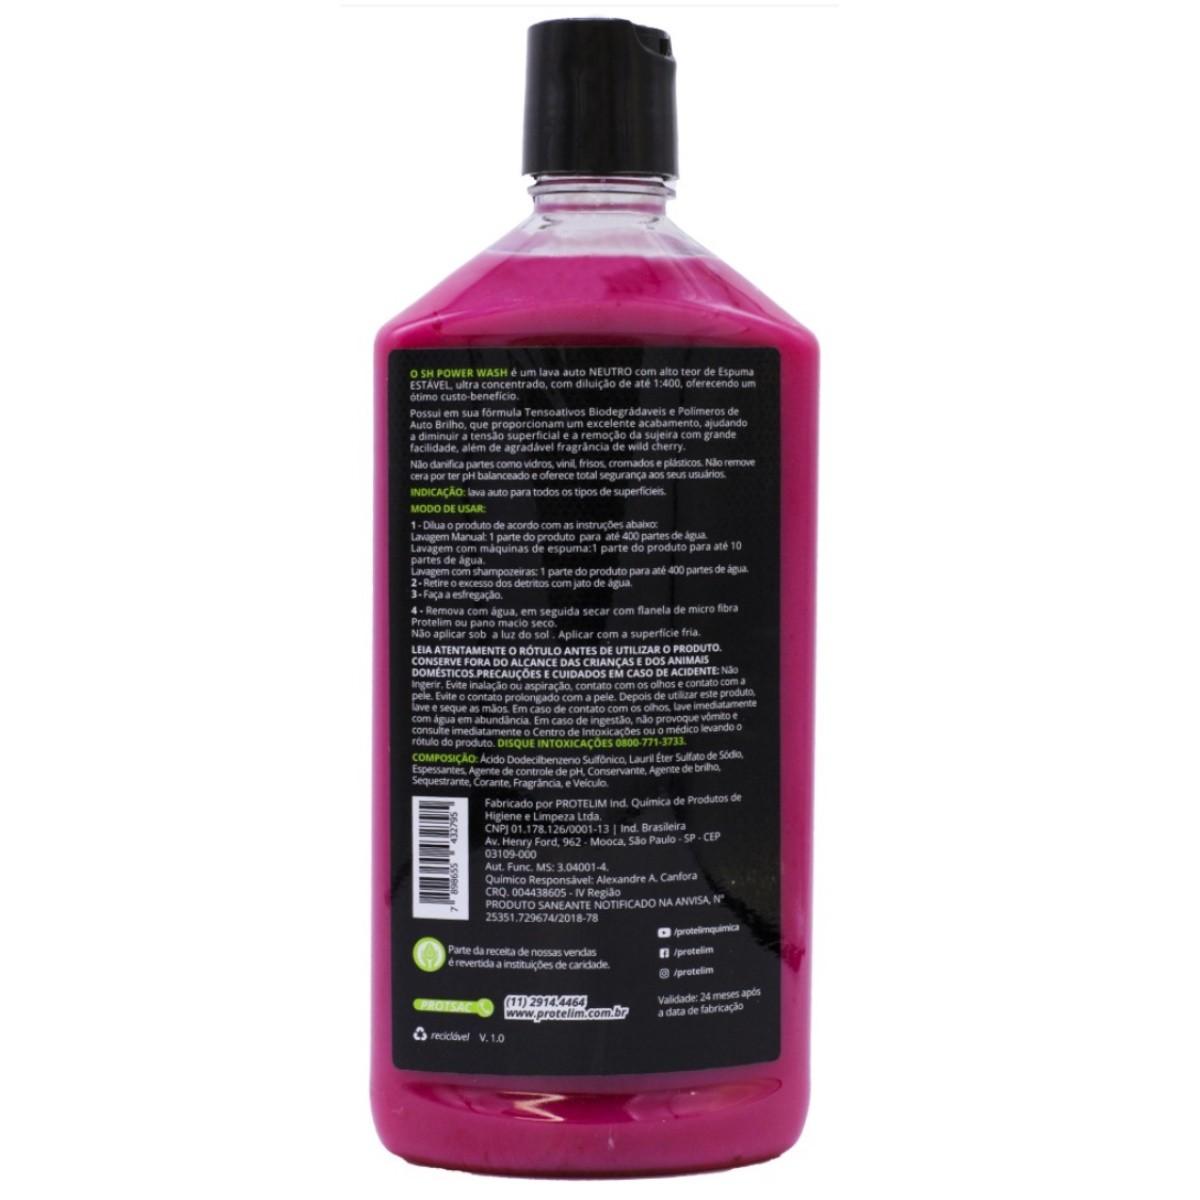 Shampoo Automotivo Lava Auto Power Wash Protelim 500ml